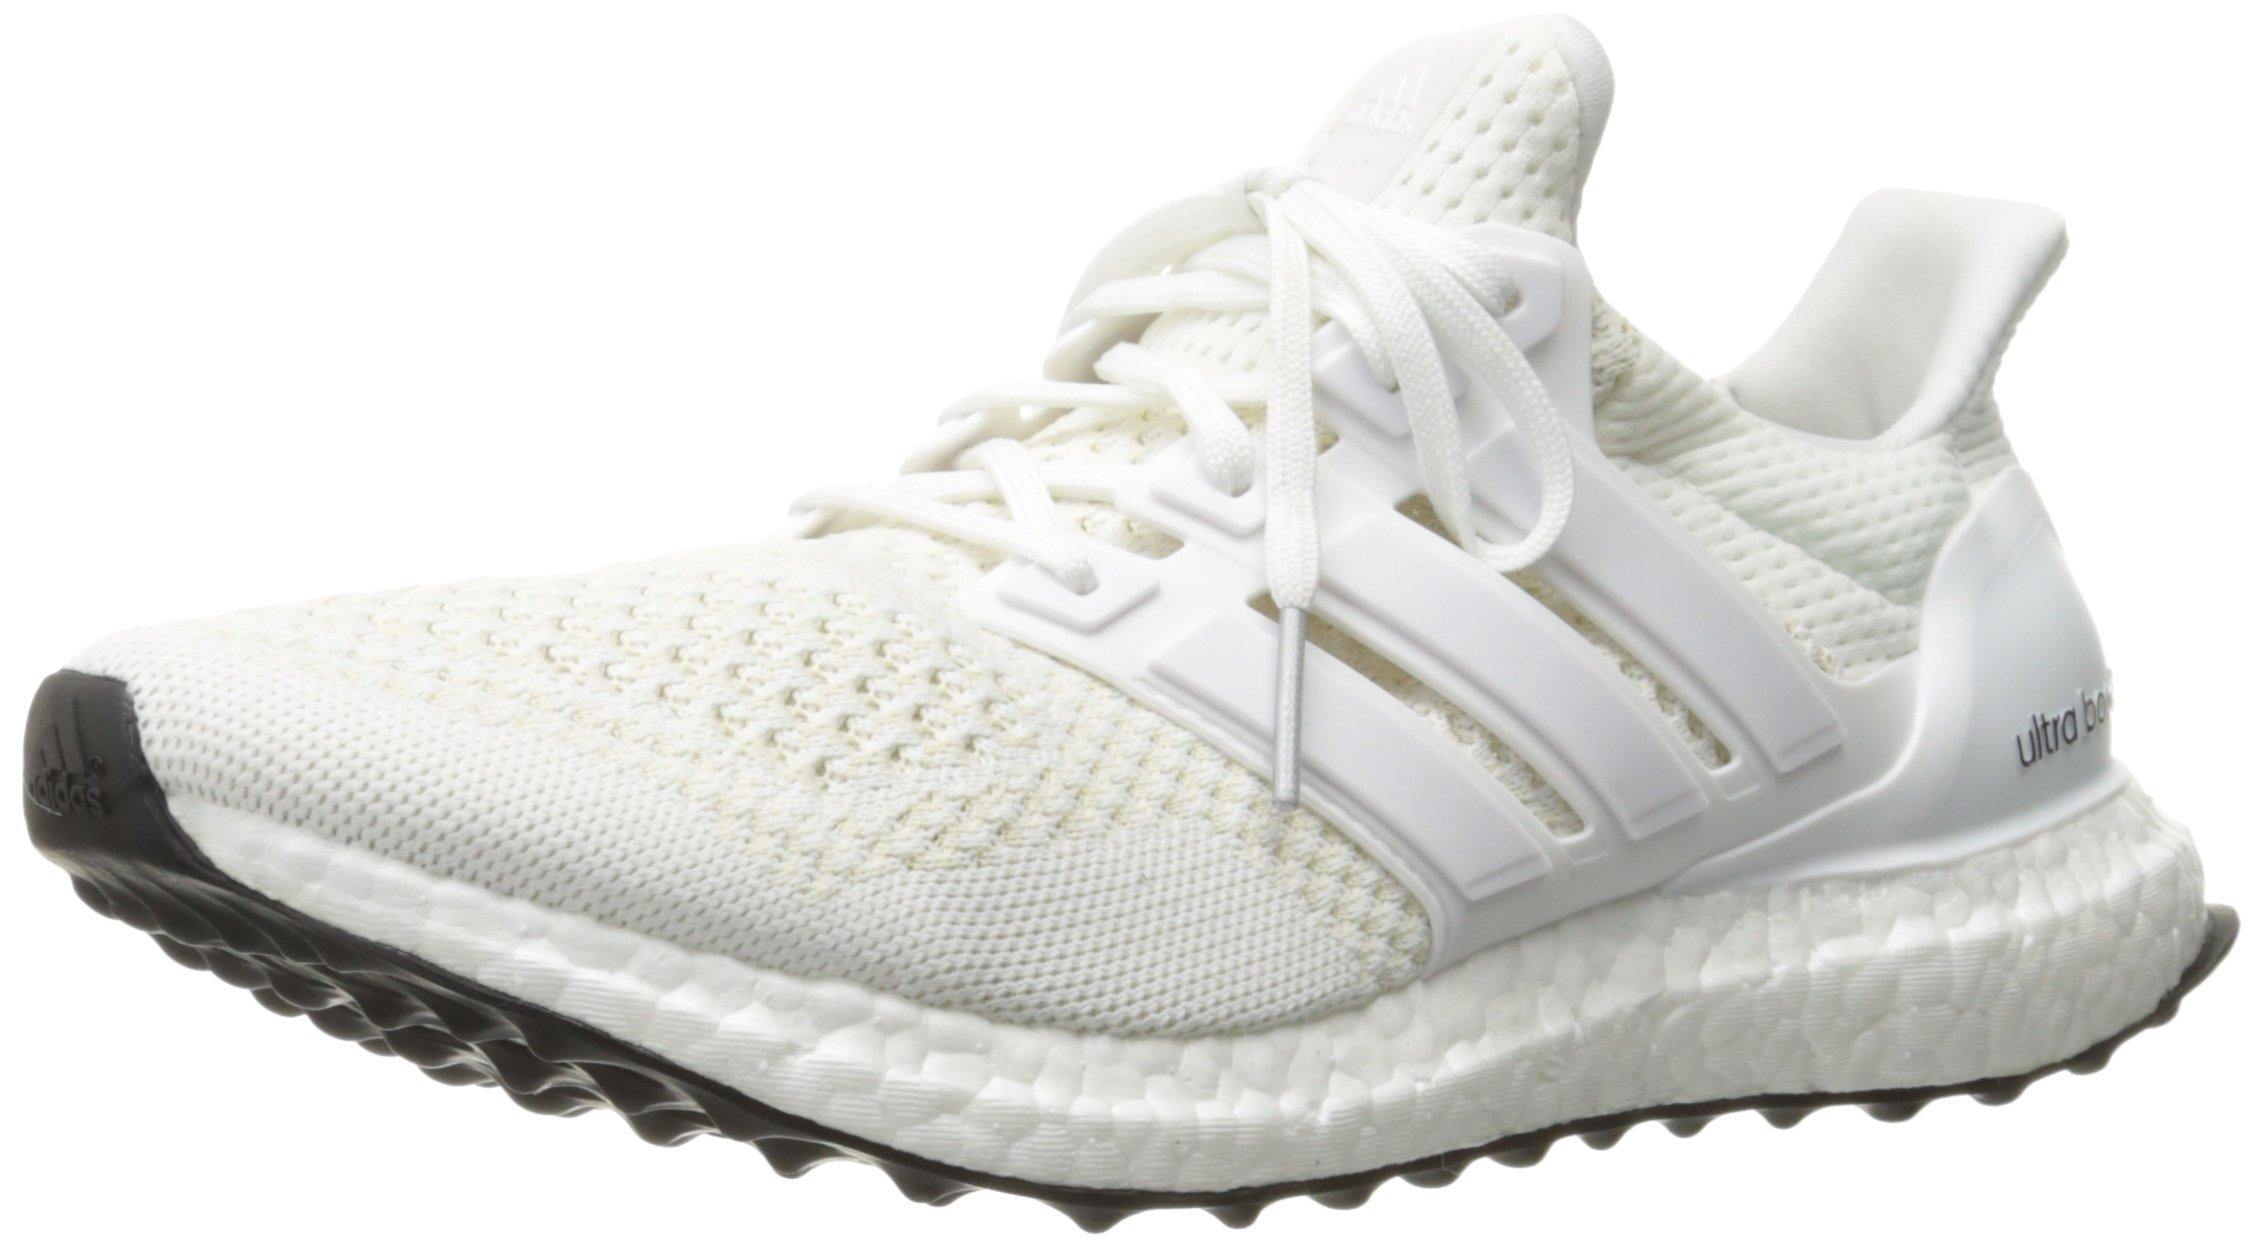 online store 20402 c0fdf Galleon - Adidas Men s Ultra Boost M Running Shoe, White Silver Metallic,  12.5 M US